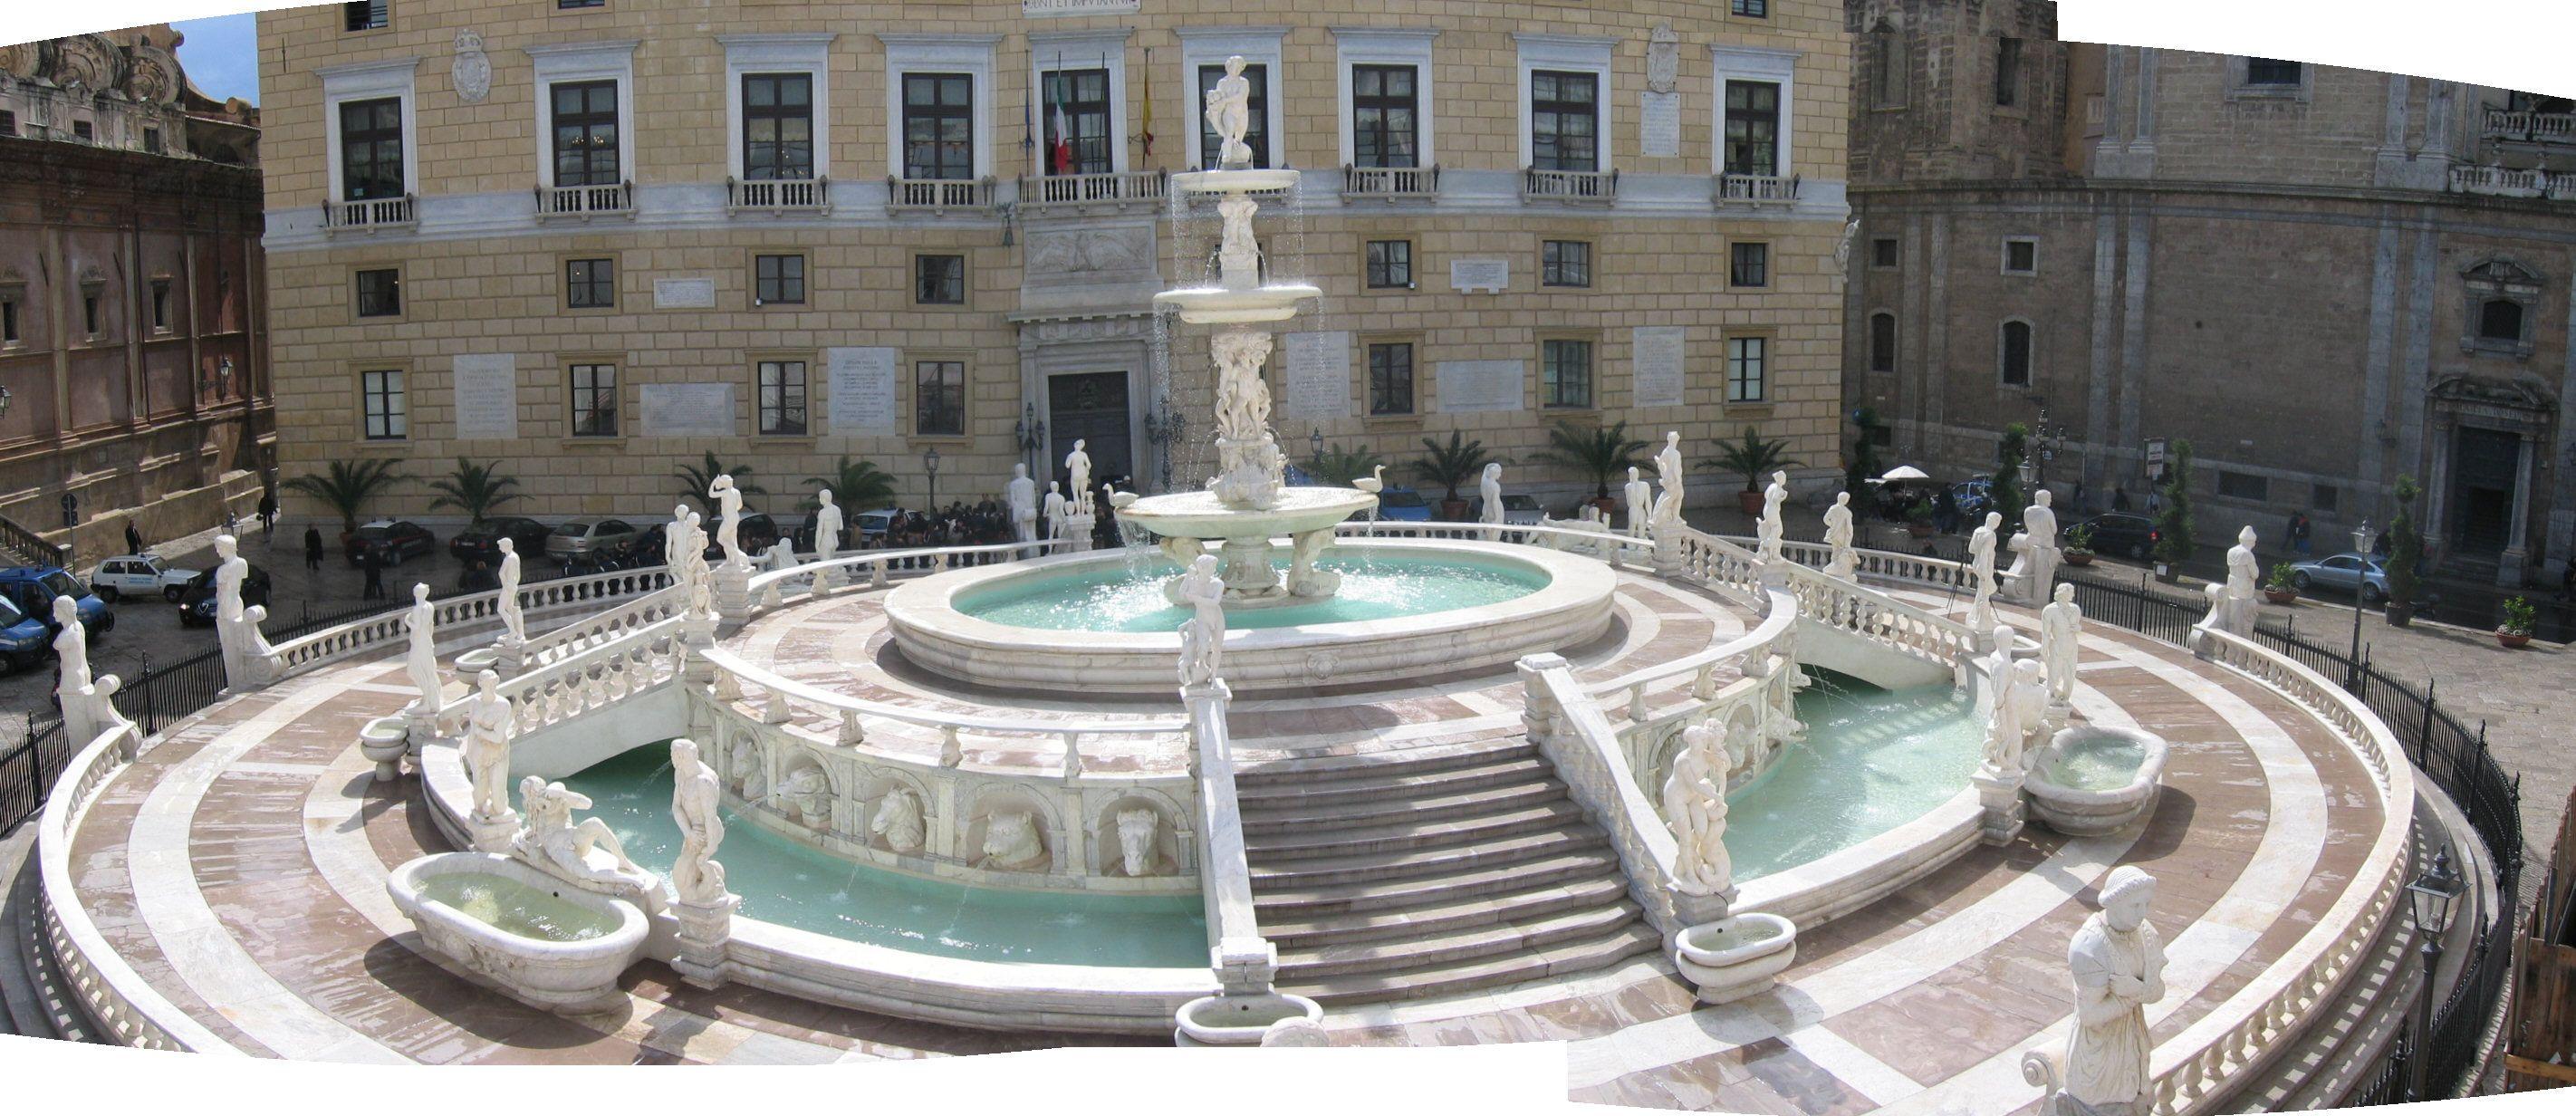 Fontana Pretoria, Palermo, Sicilia. | Sicilia | Pinterest | Pretoria ...